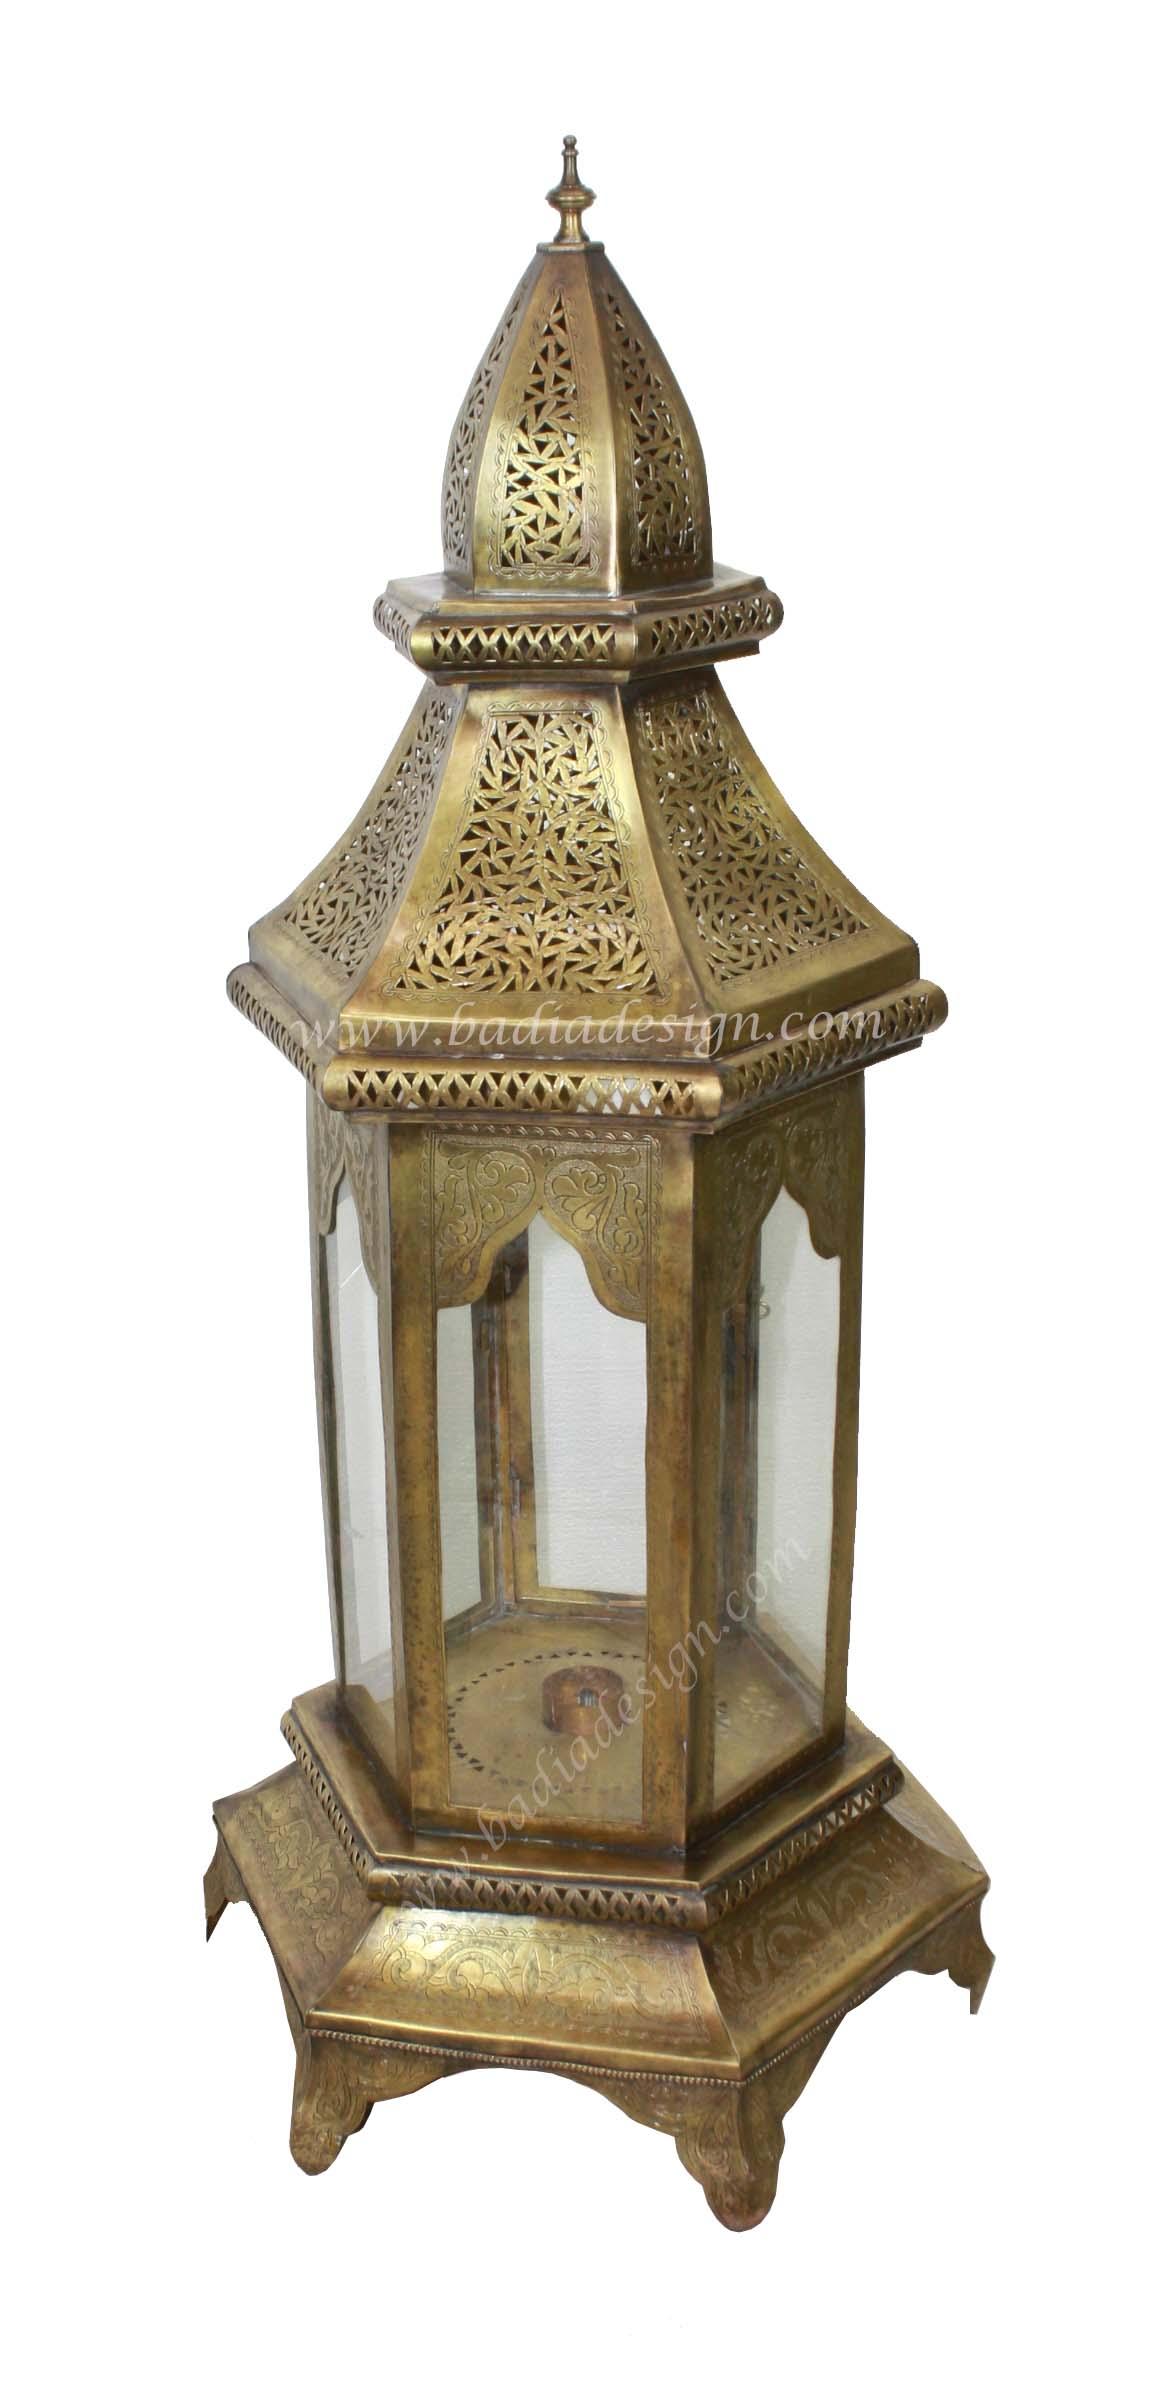 large-moroccan-floor-lantern-lig252-1.jpg